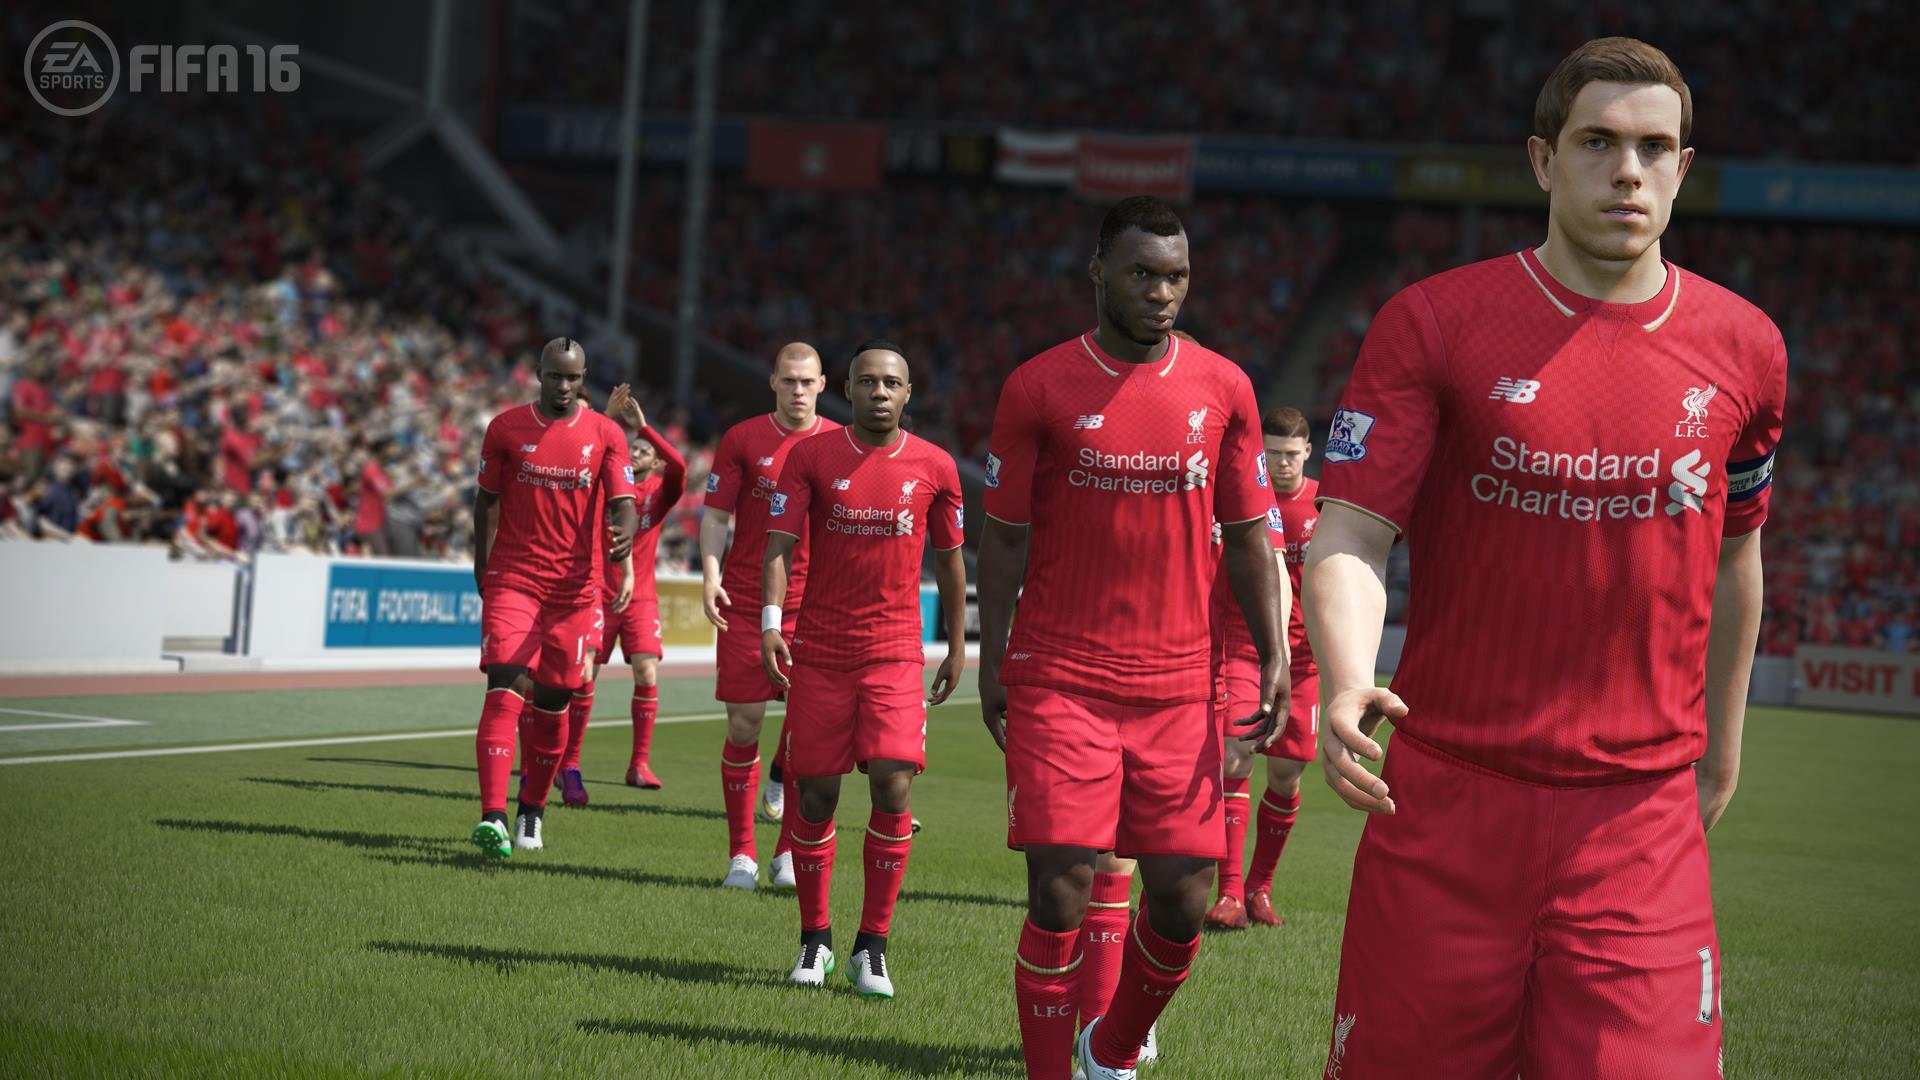 Image for EU PSN's 12 deals of Christmas sale: FIFA 16